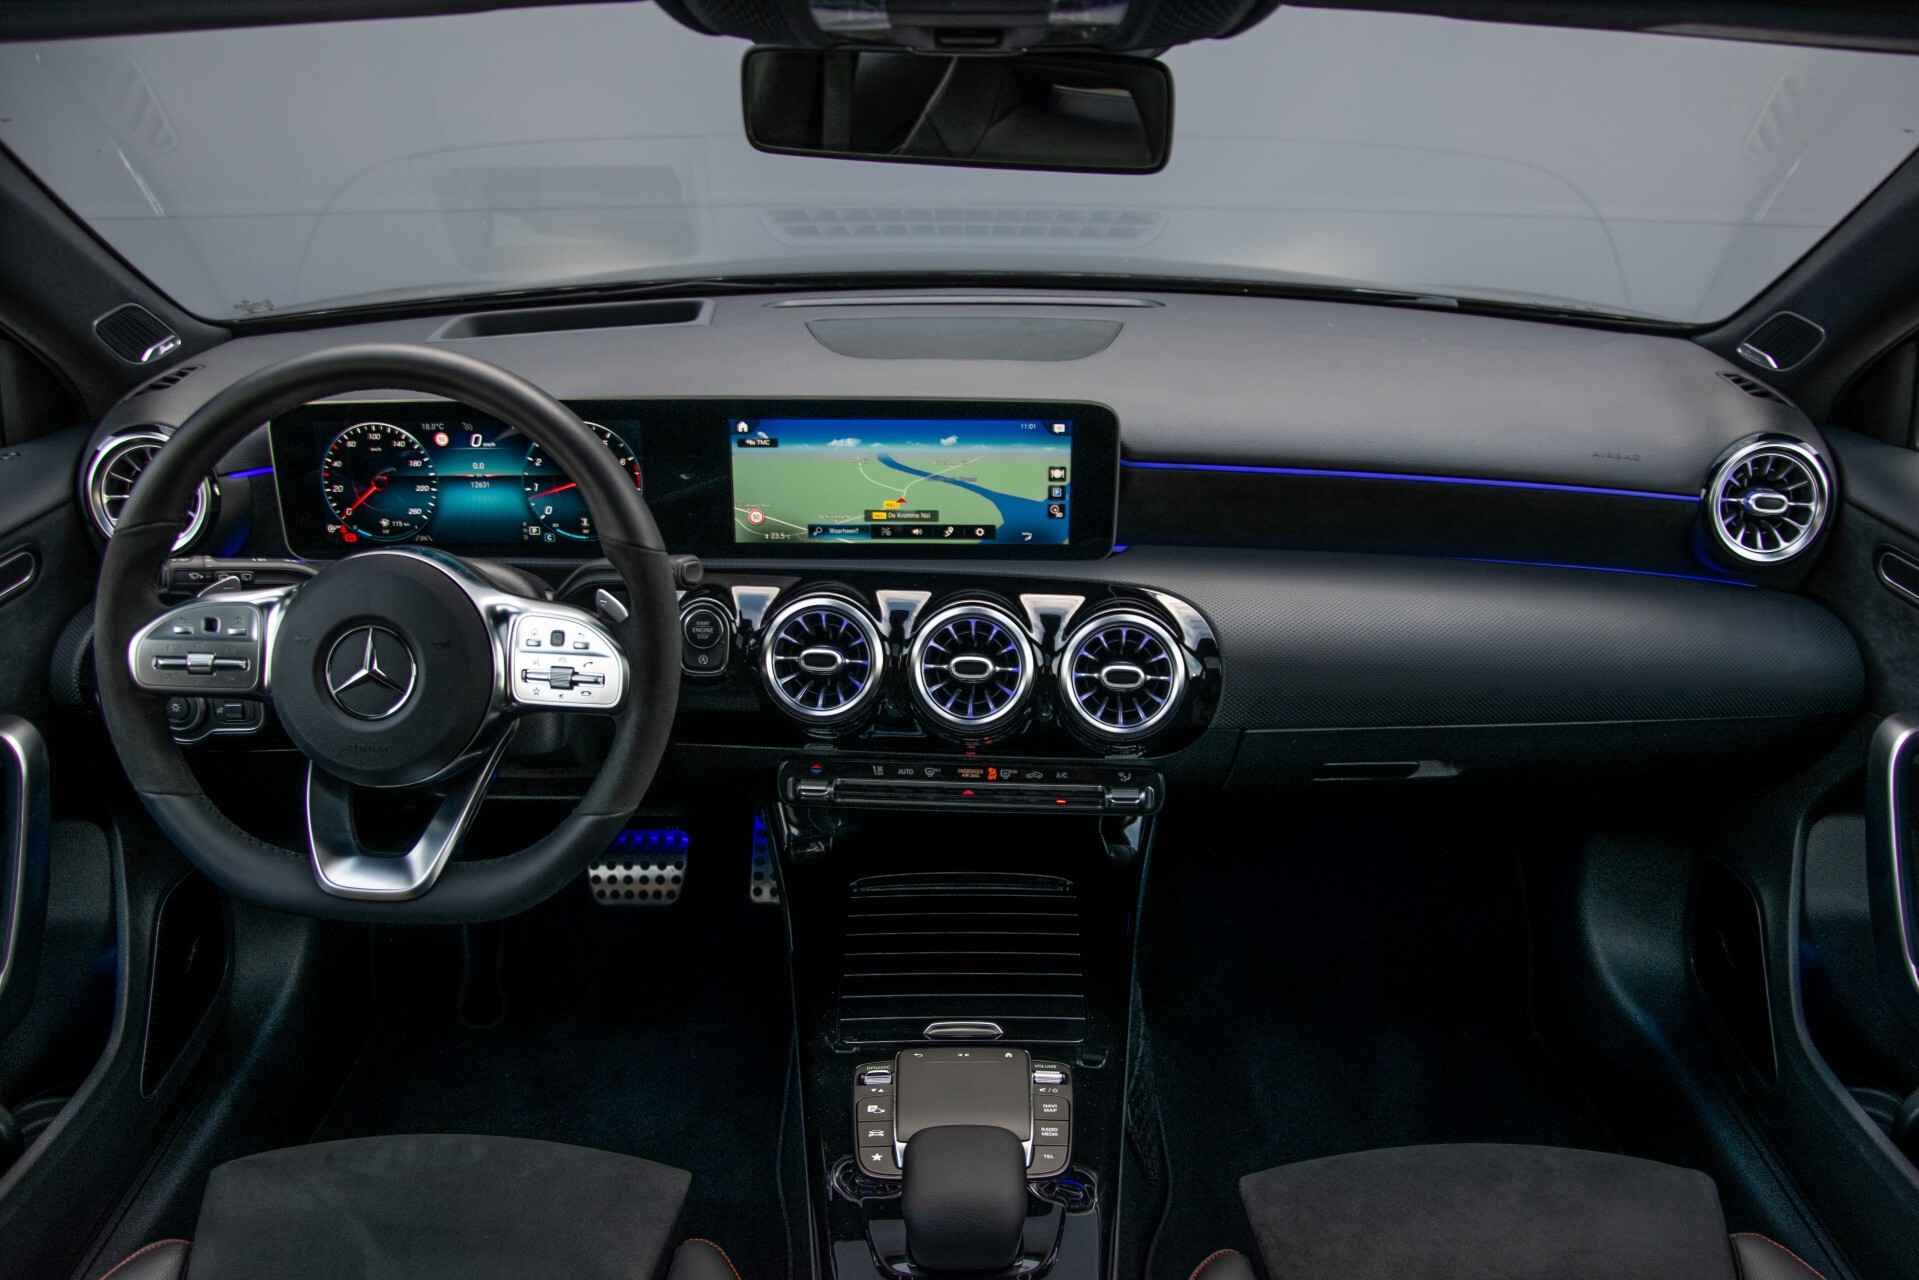 Mercedes-Benz A-Klasse 250 4-M AMG Panorama/Keyless-Entry/MBUX/HUD/Burmester/360/Multibeam LED Aut7 Foto 8